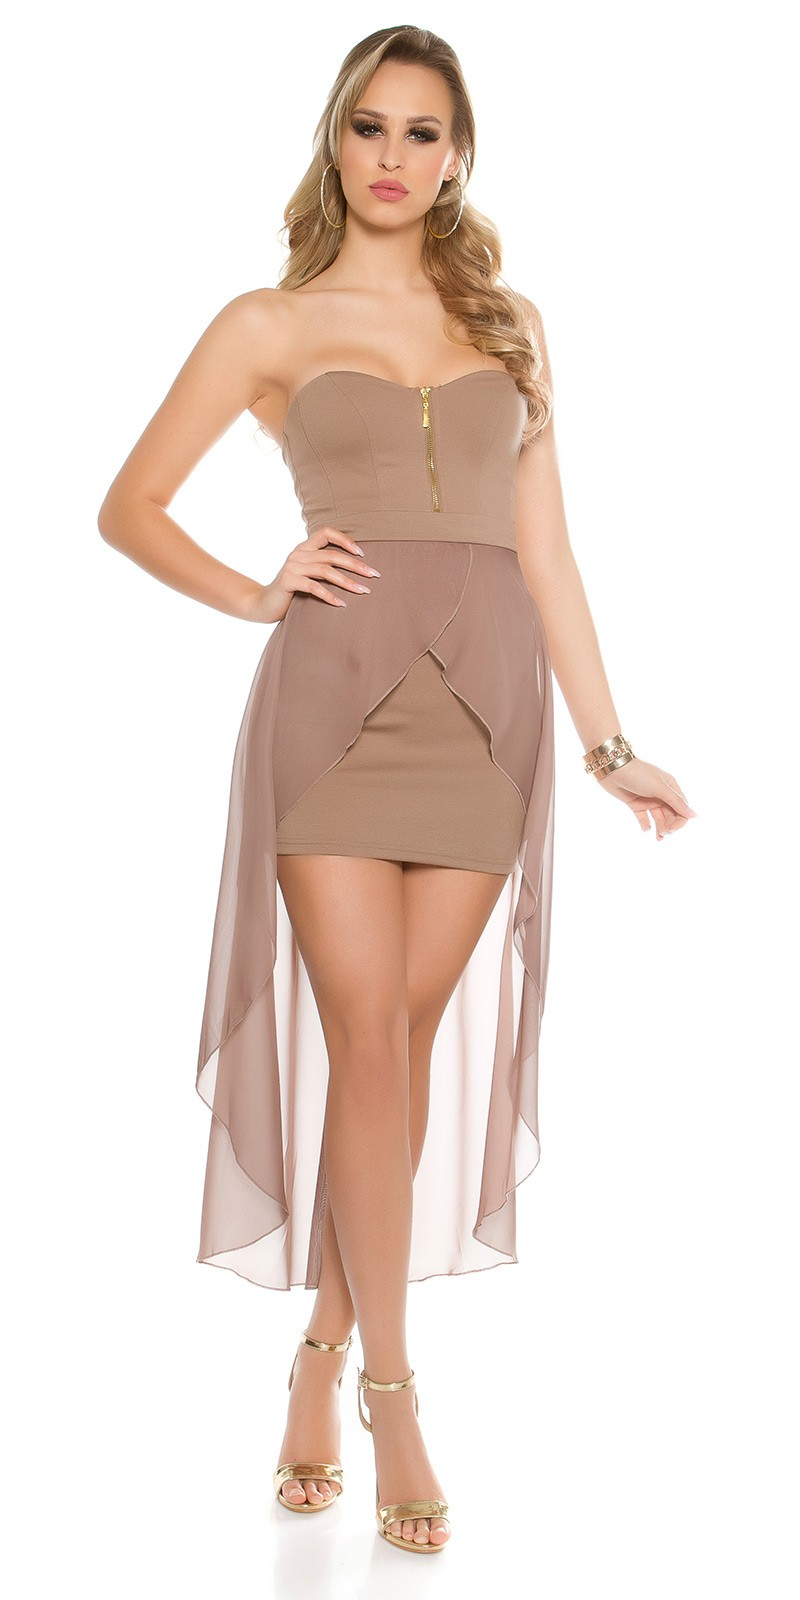 61cadd637a NŐI RUHA   Muszlin rátétes női alkalmi ruha - Capuccino (M-L ...